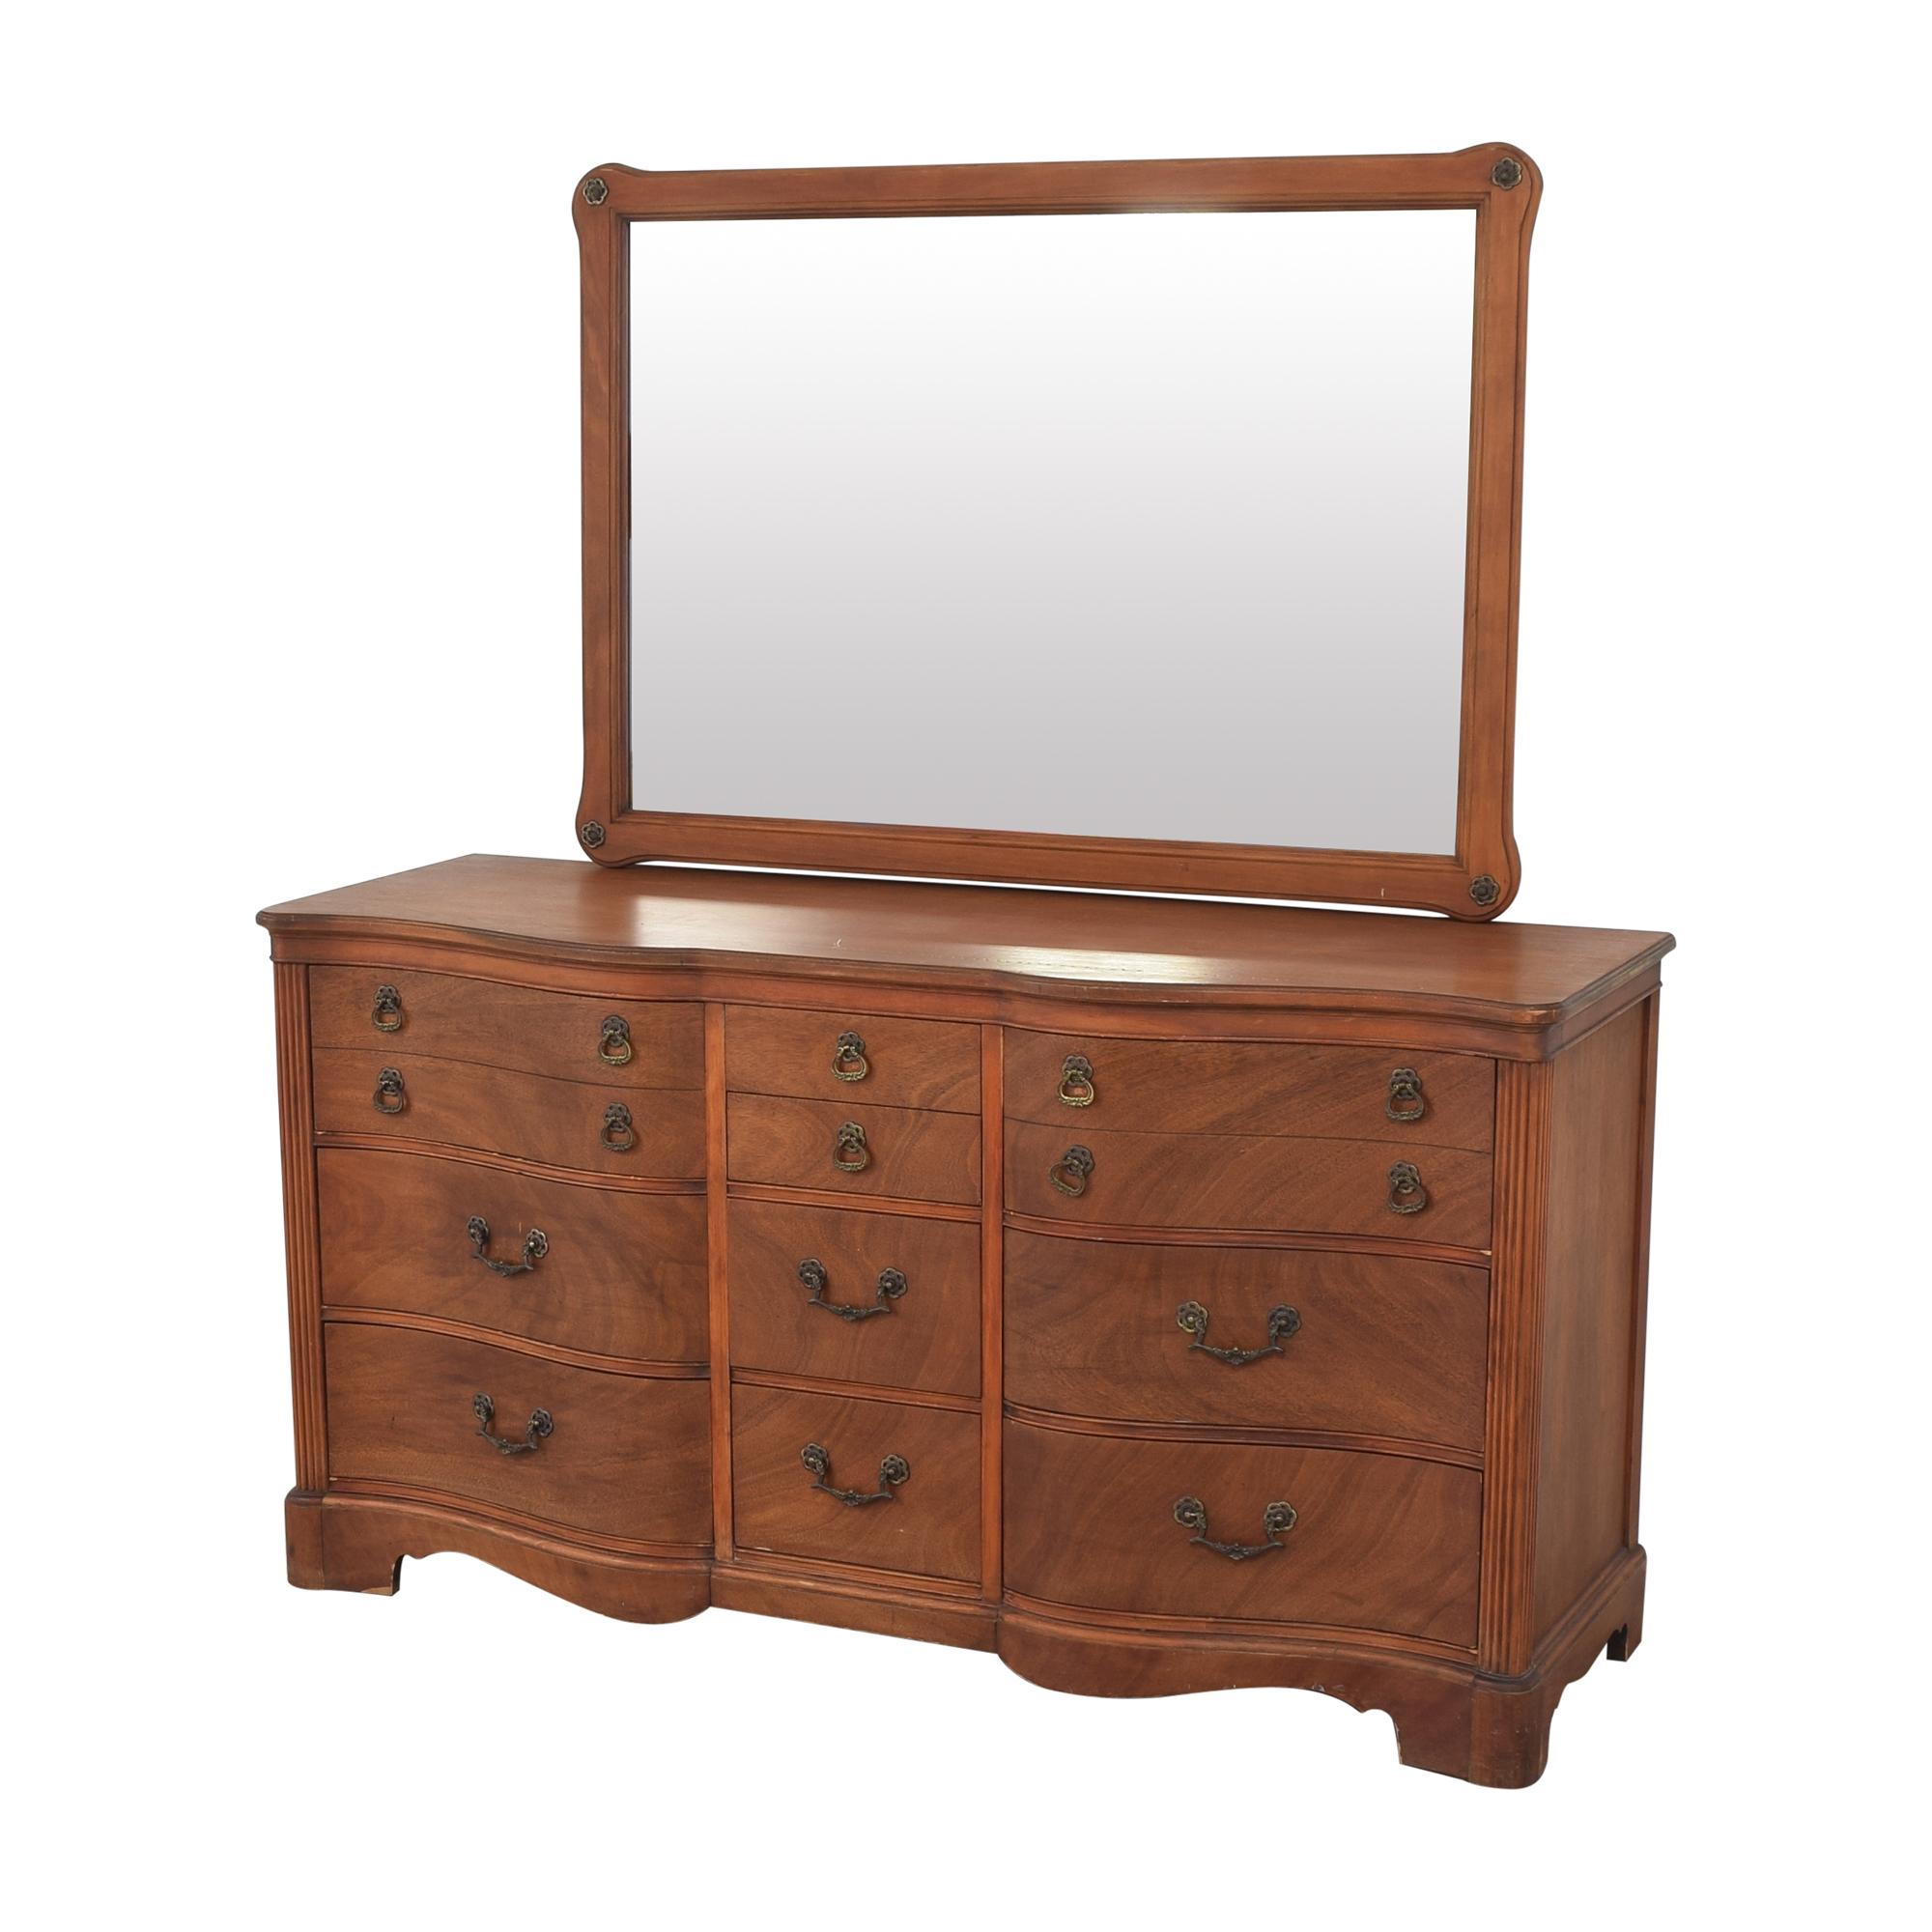 Drexel Triple Dresser with Mirror sale